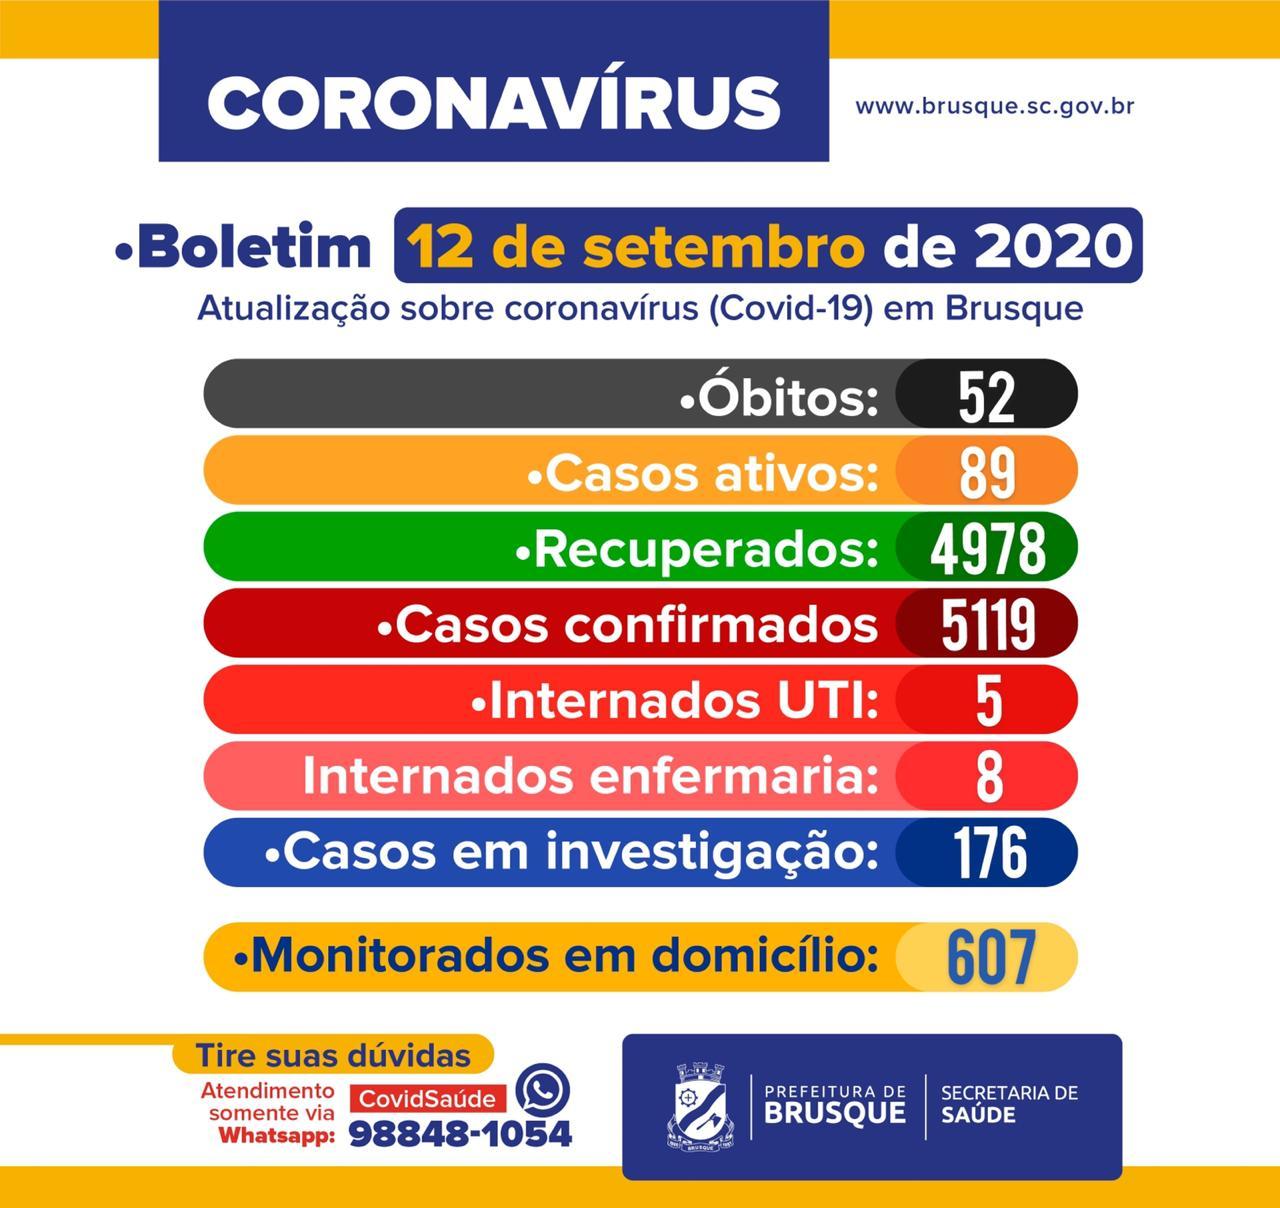 COVID-19: Boletim epidemiológico 12 de setembro